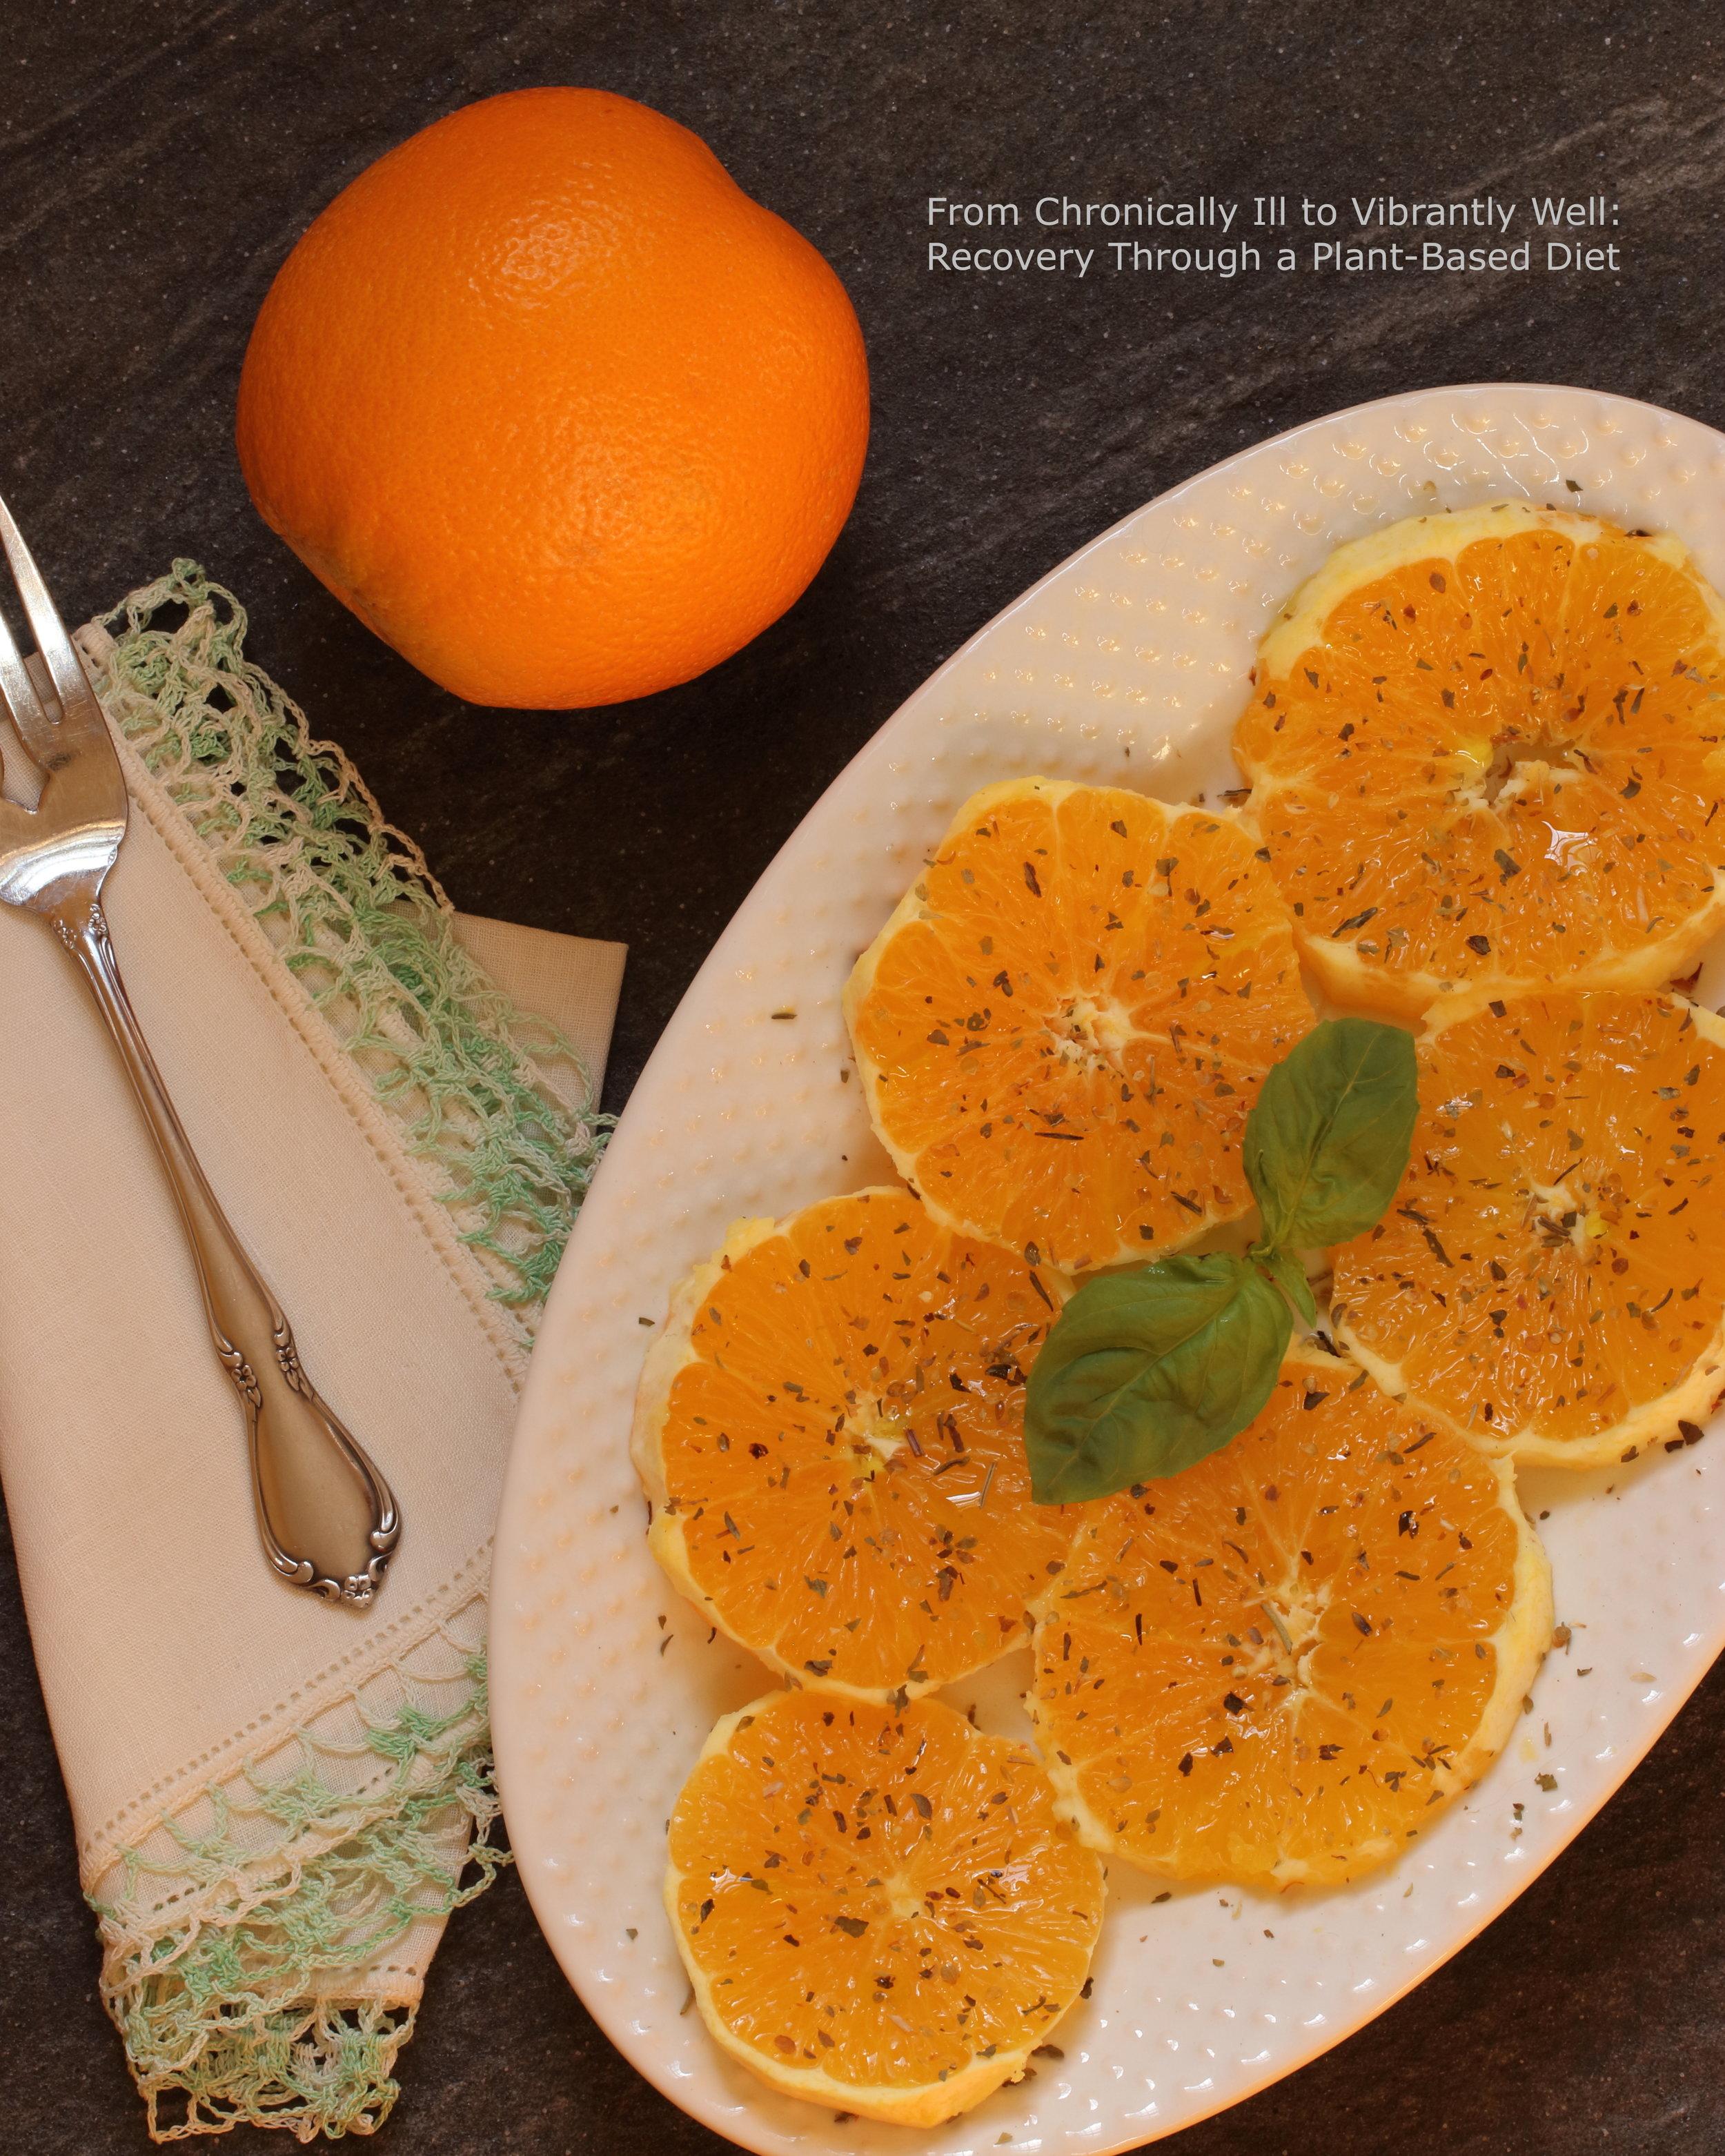 Ma Tante's Orange Salad